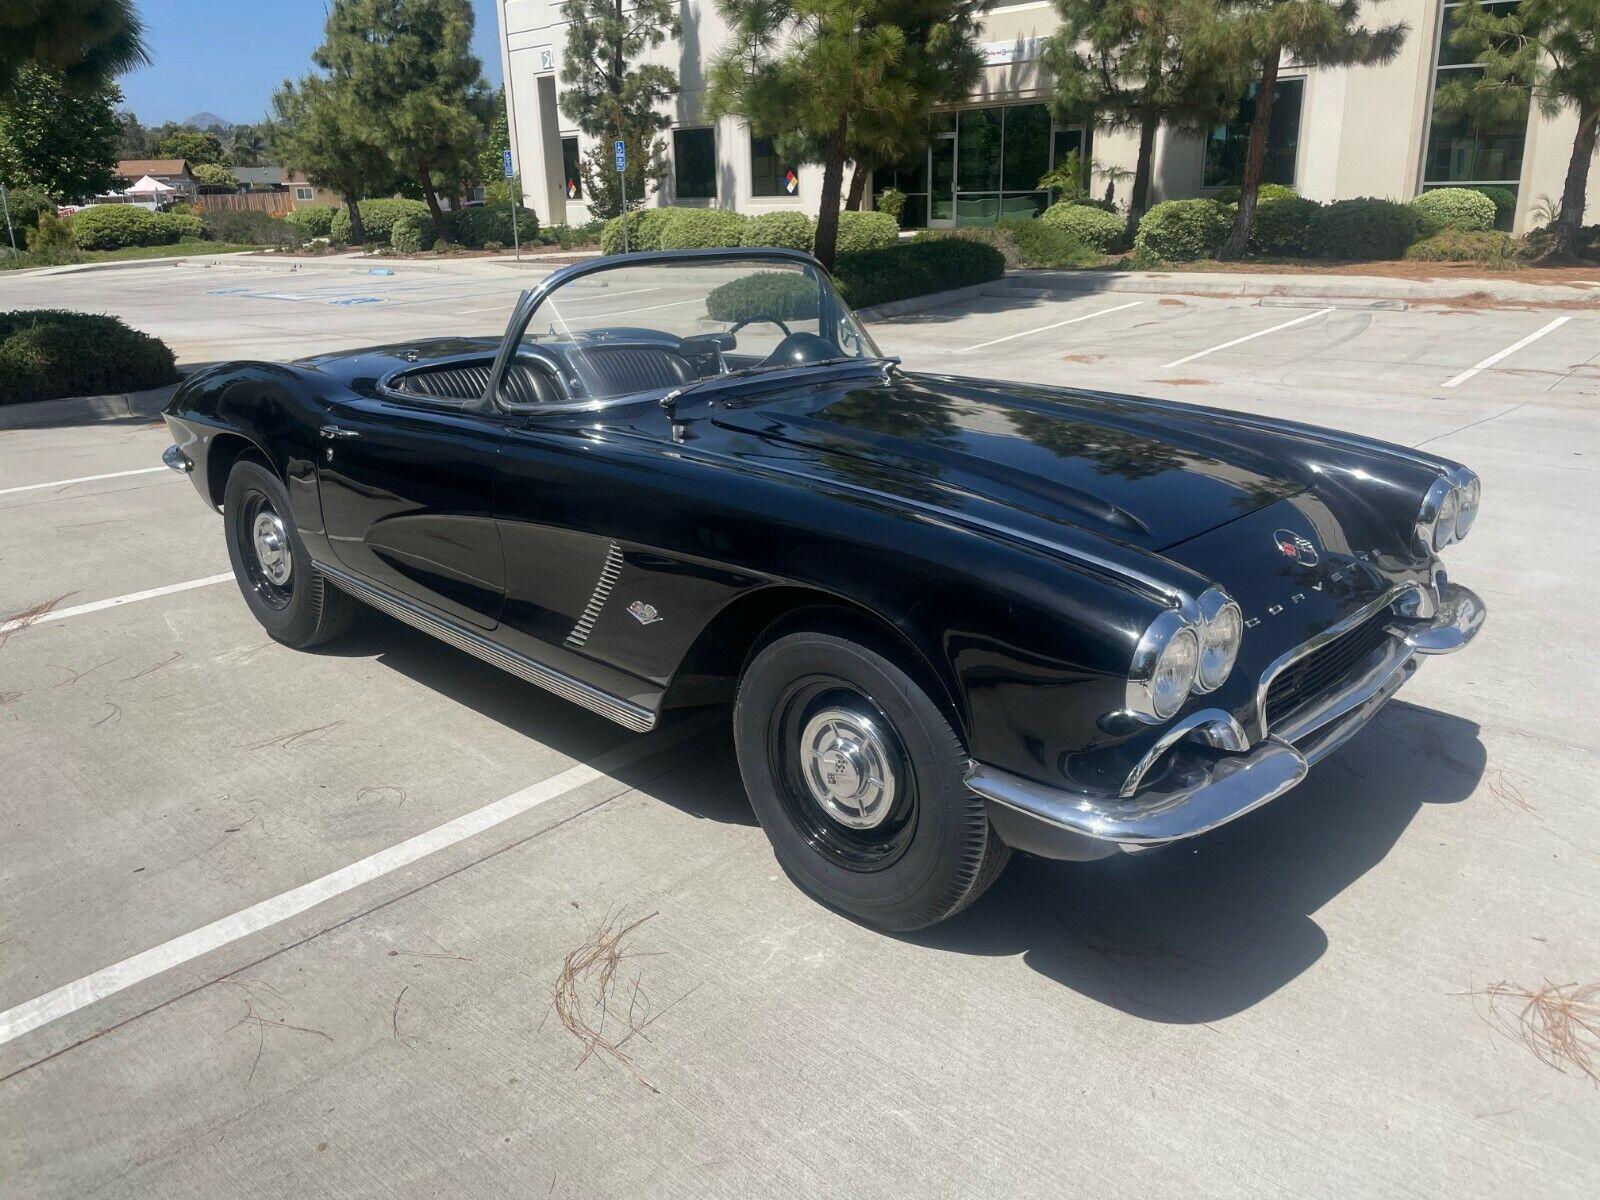 1962 Black Chevrolet Corvette   | C1 Corvette Photo 2